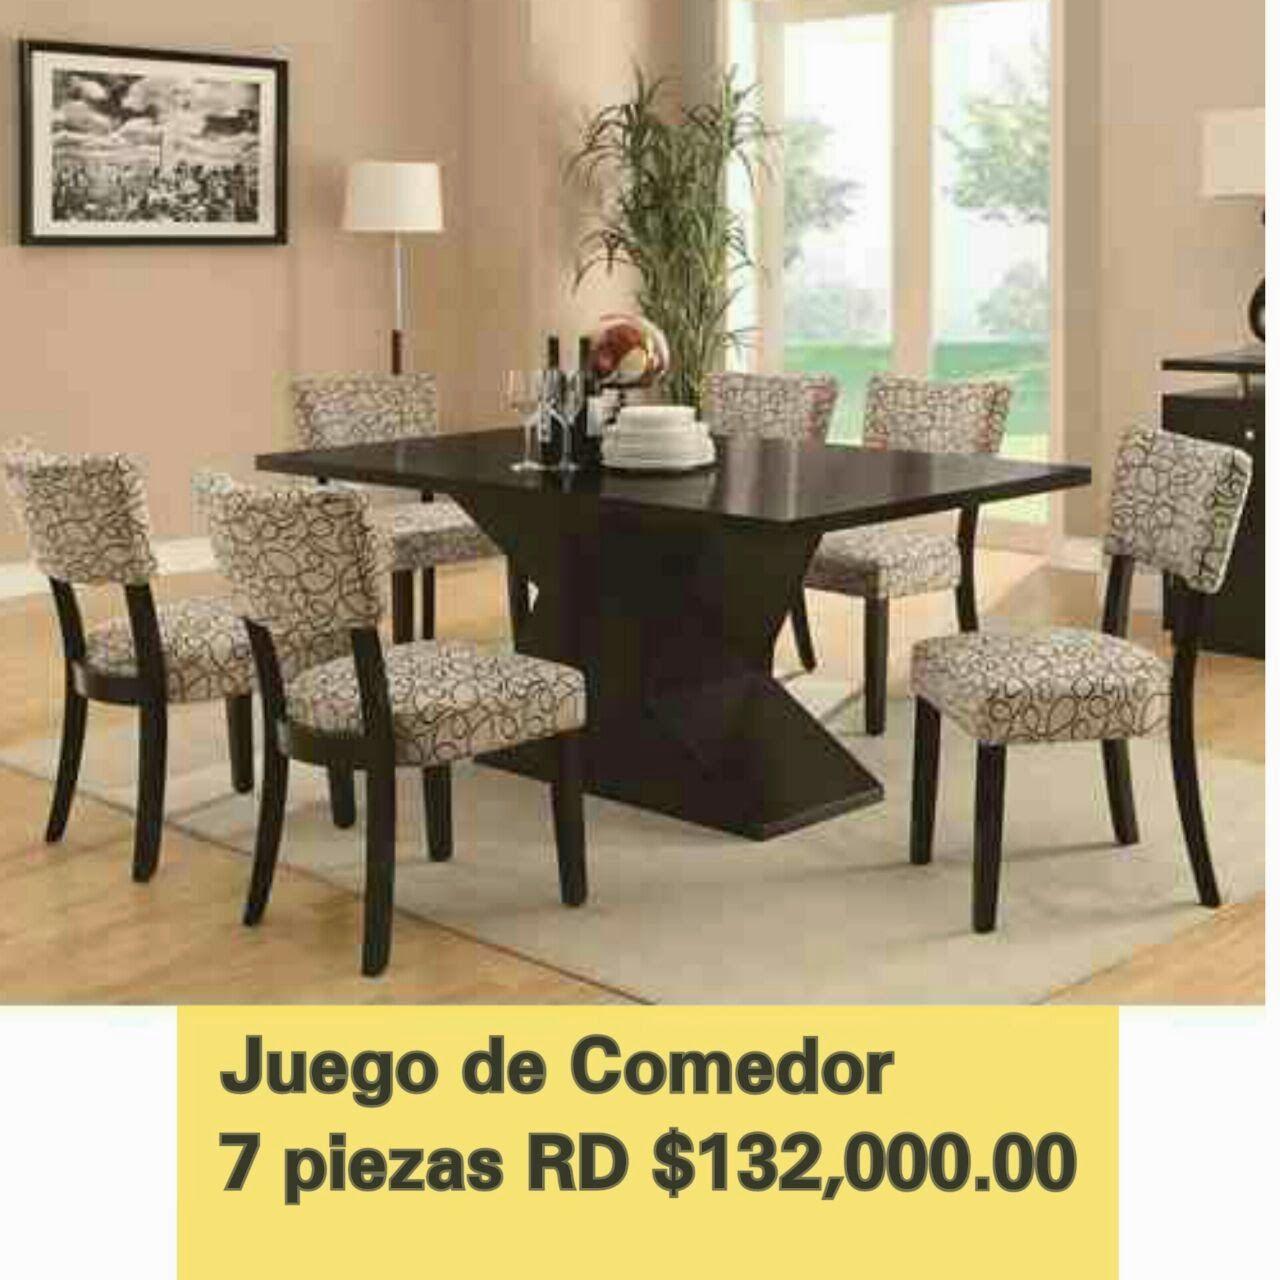 Daliza : Juego de comedor moderno \'Por solo 132,000 pesos o ...